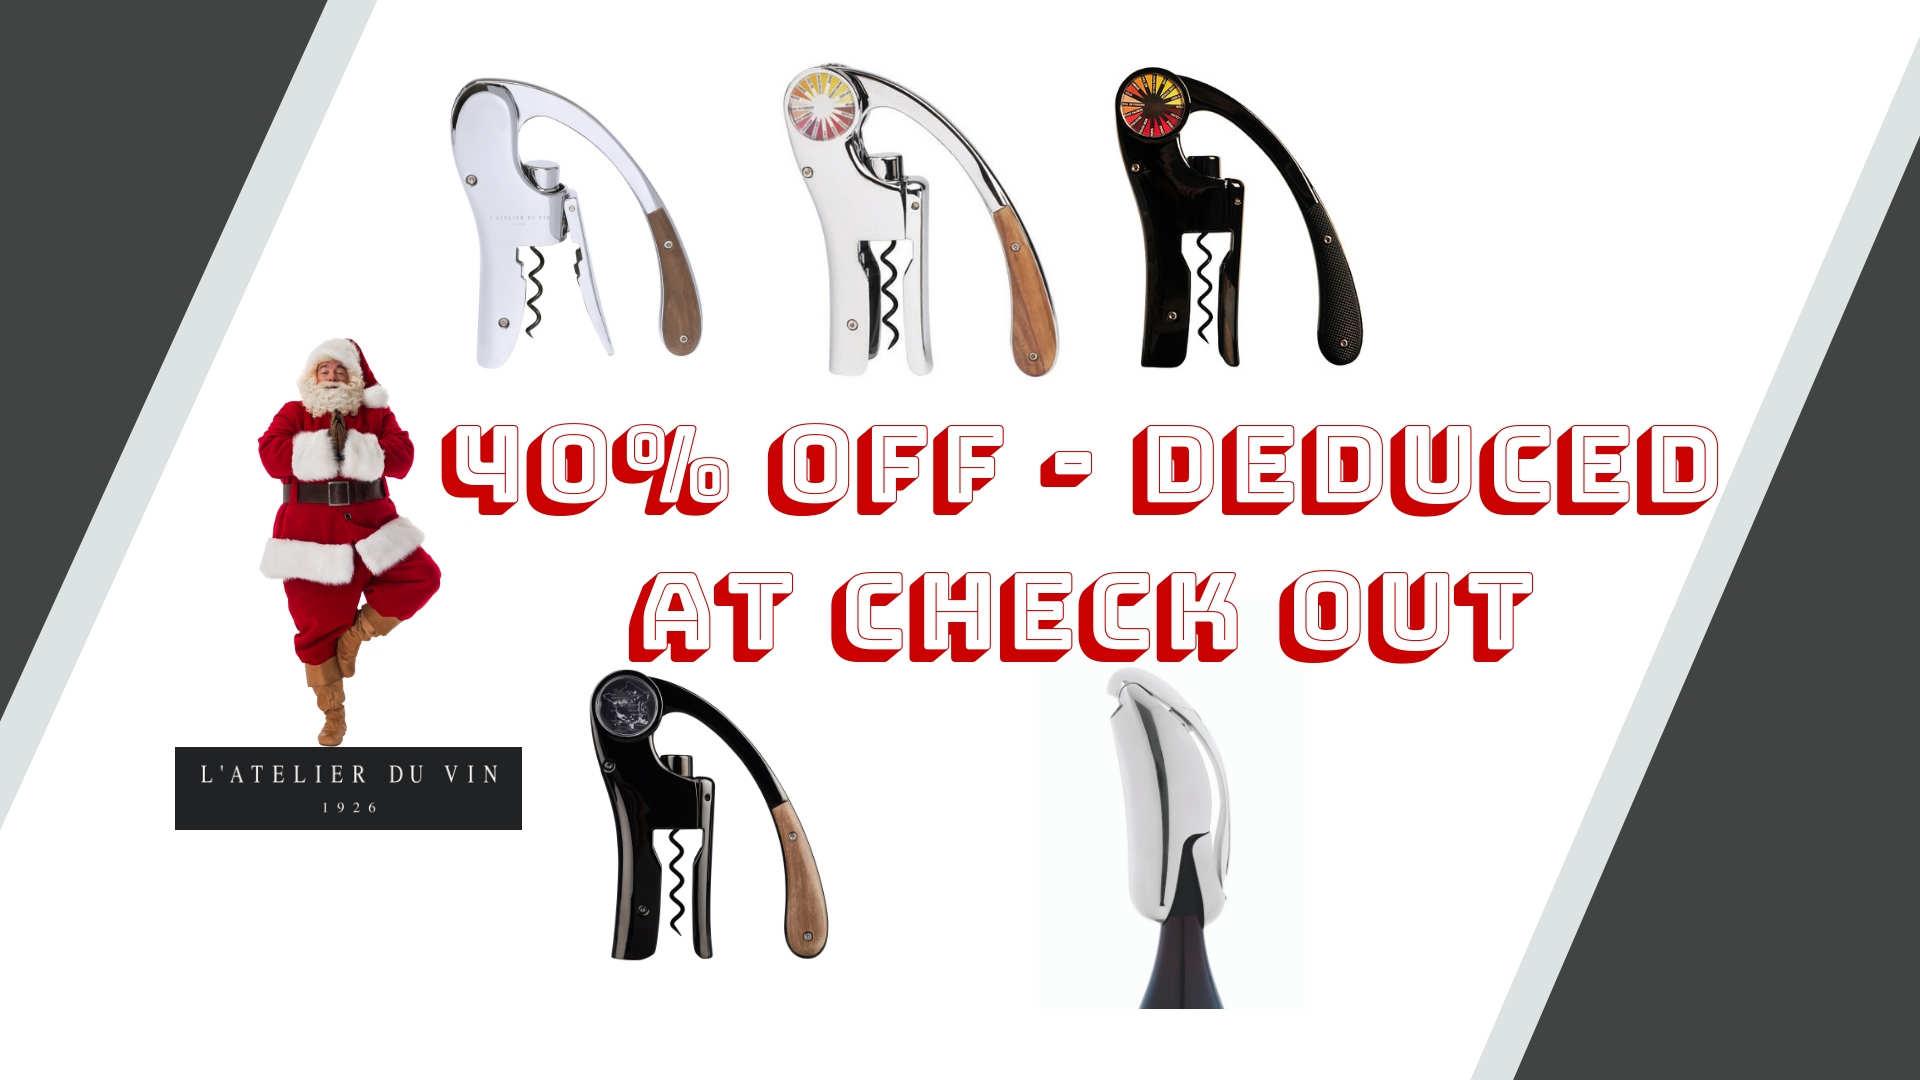 WOW Christmas Promo L'Atelier du Vin on Oeno Motion lever corkscrews